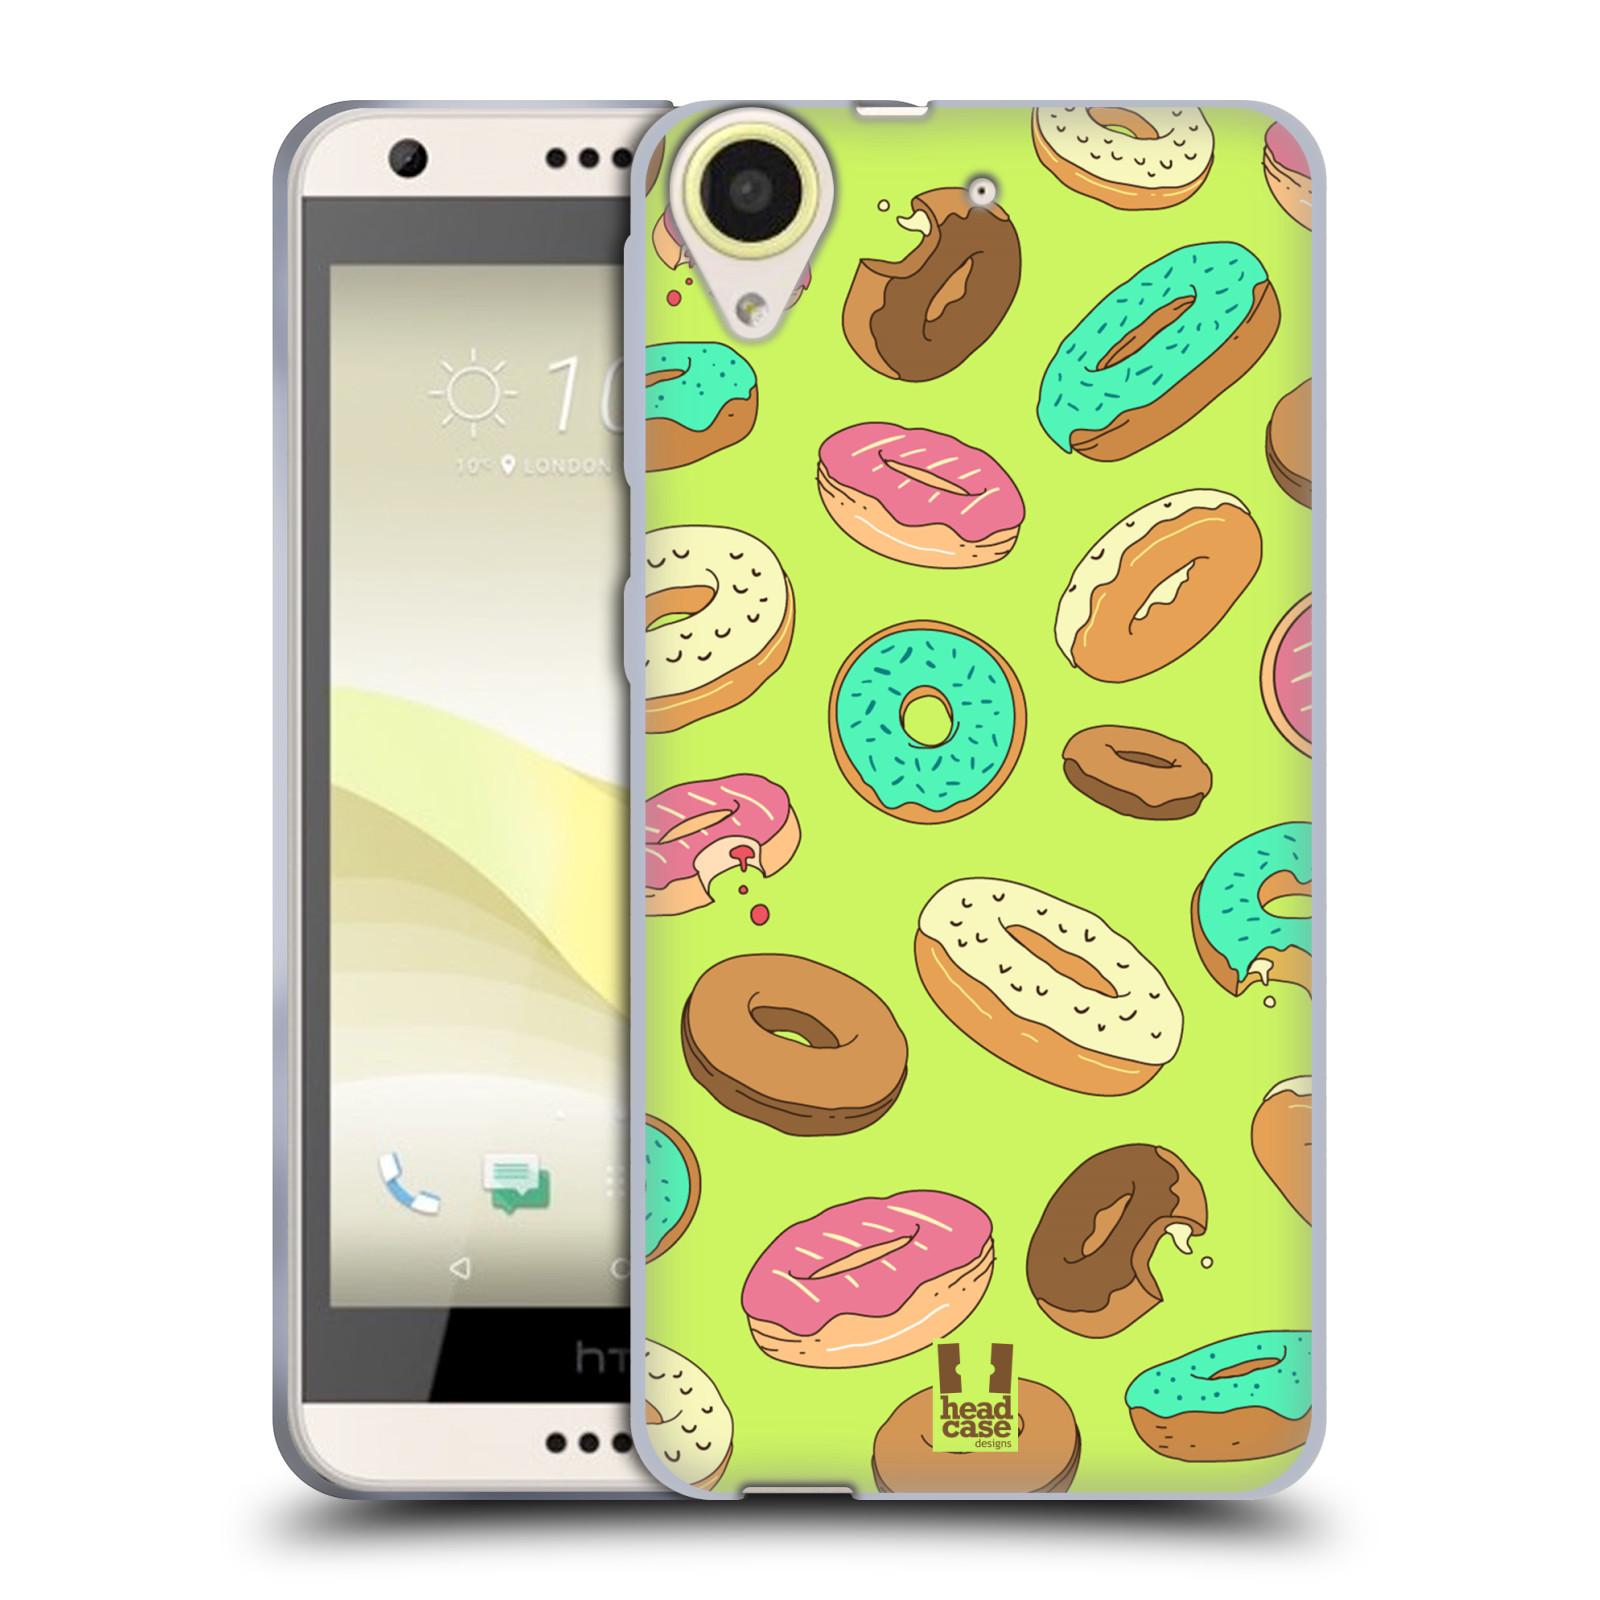 Silikonové pouzdro na mobil HTC Desire 650 HEAD CASE DONUTKY (Silikonový kryt či obal na mobilní telefon HTC Desire 650)